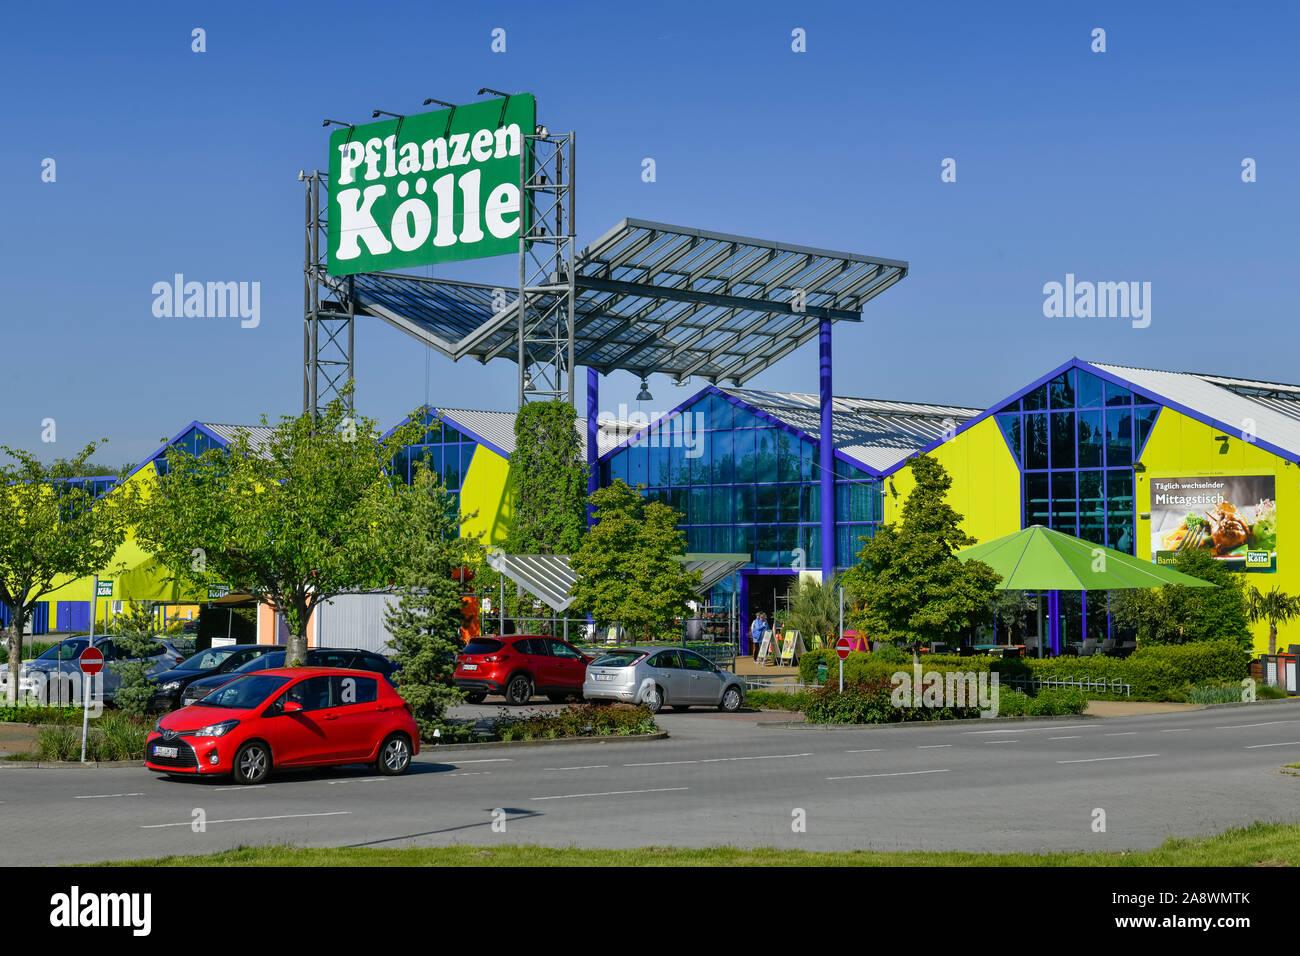 Pflanzen Kölle, A10 Shoppingcenter, Brandenburg, Deutschland Stock Photo